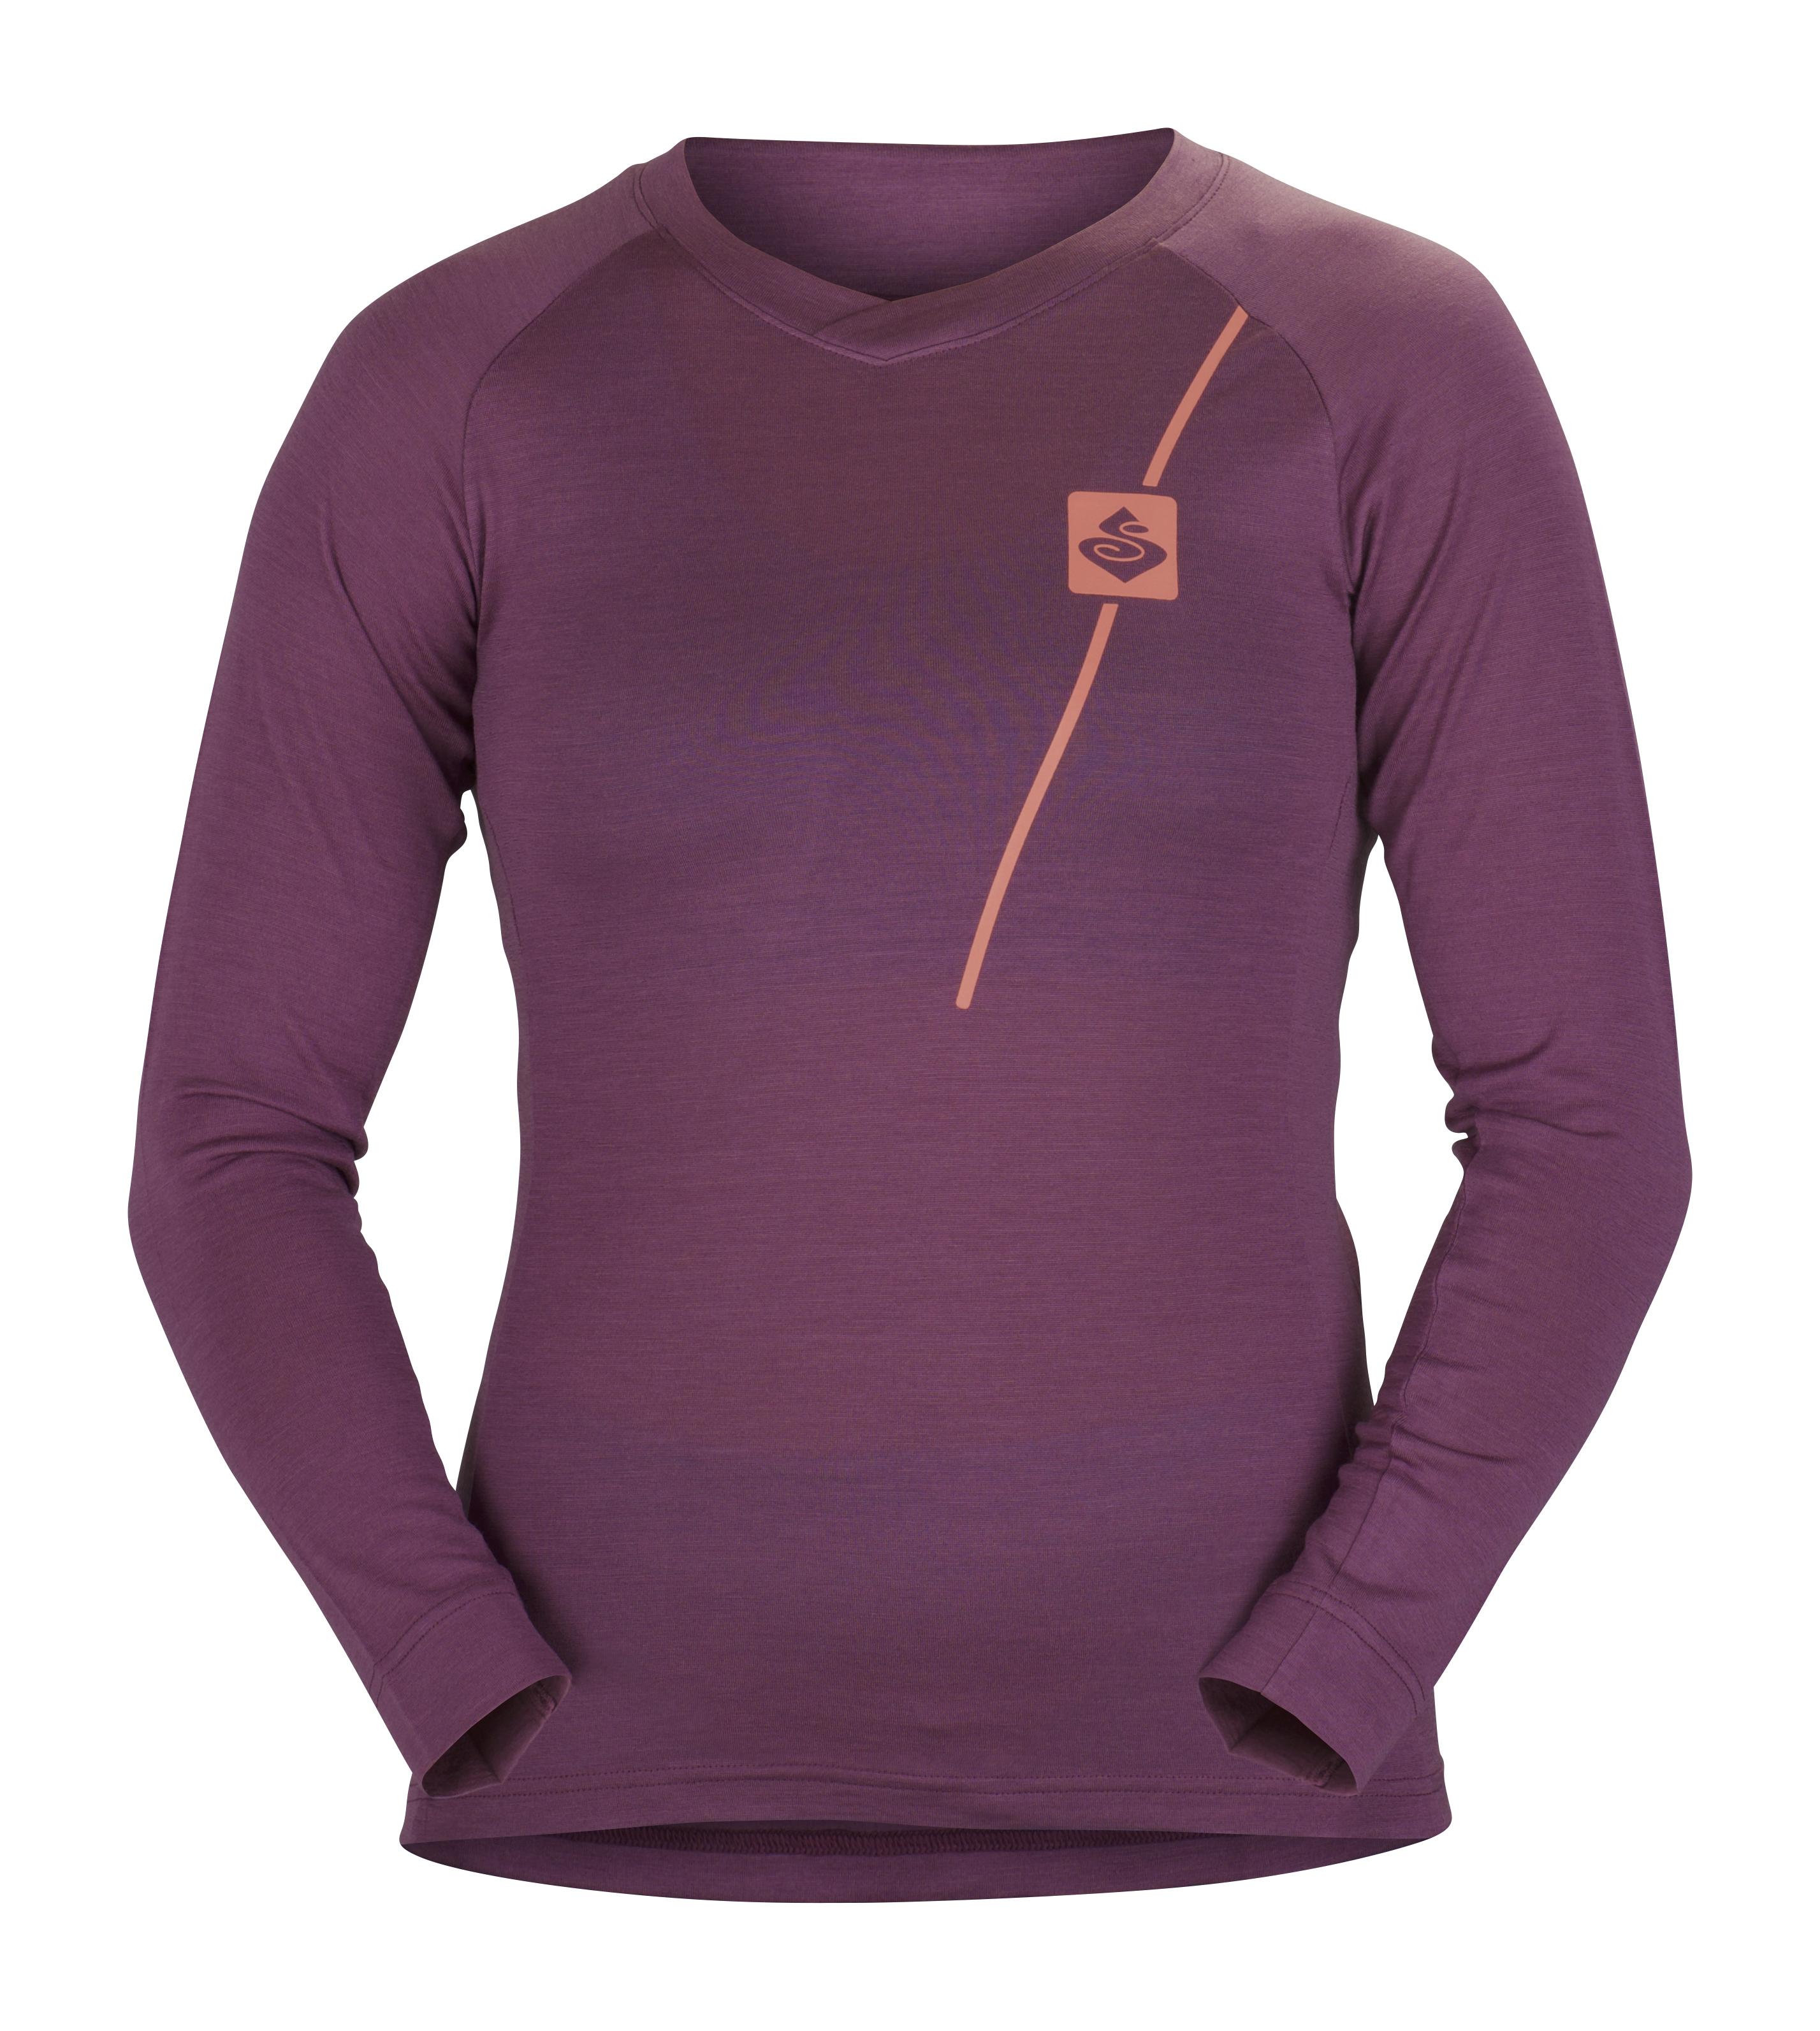 828069-badlands_merino_ls_jersey_wmns-vibrant_violet-front.jpg